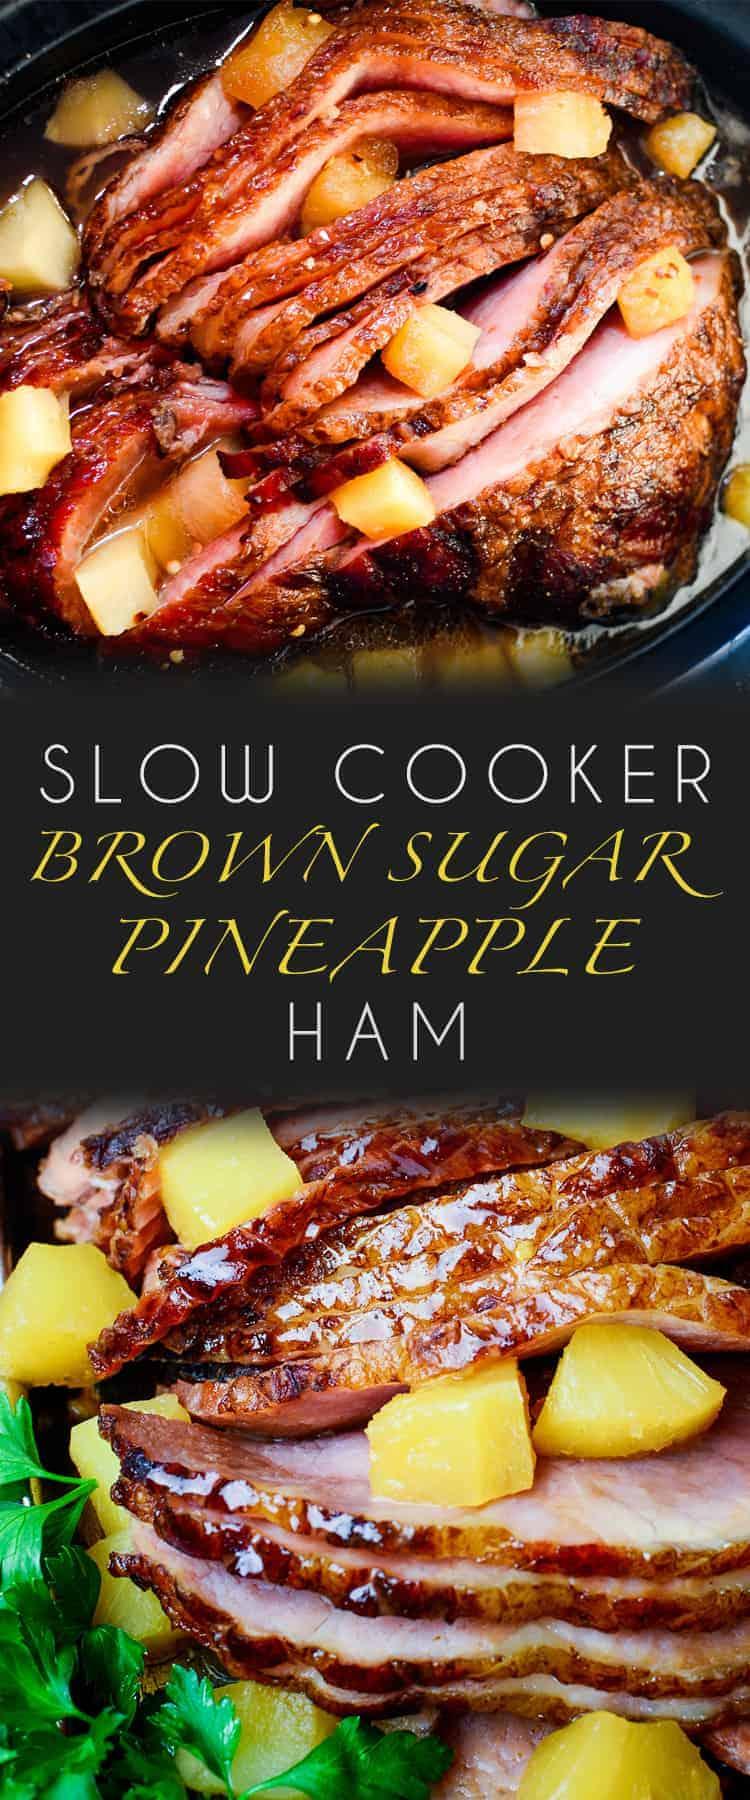 Slow Cooker Pineapple Ham